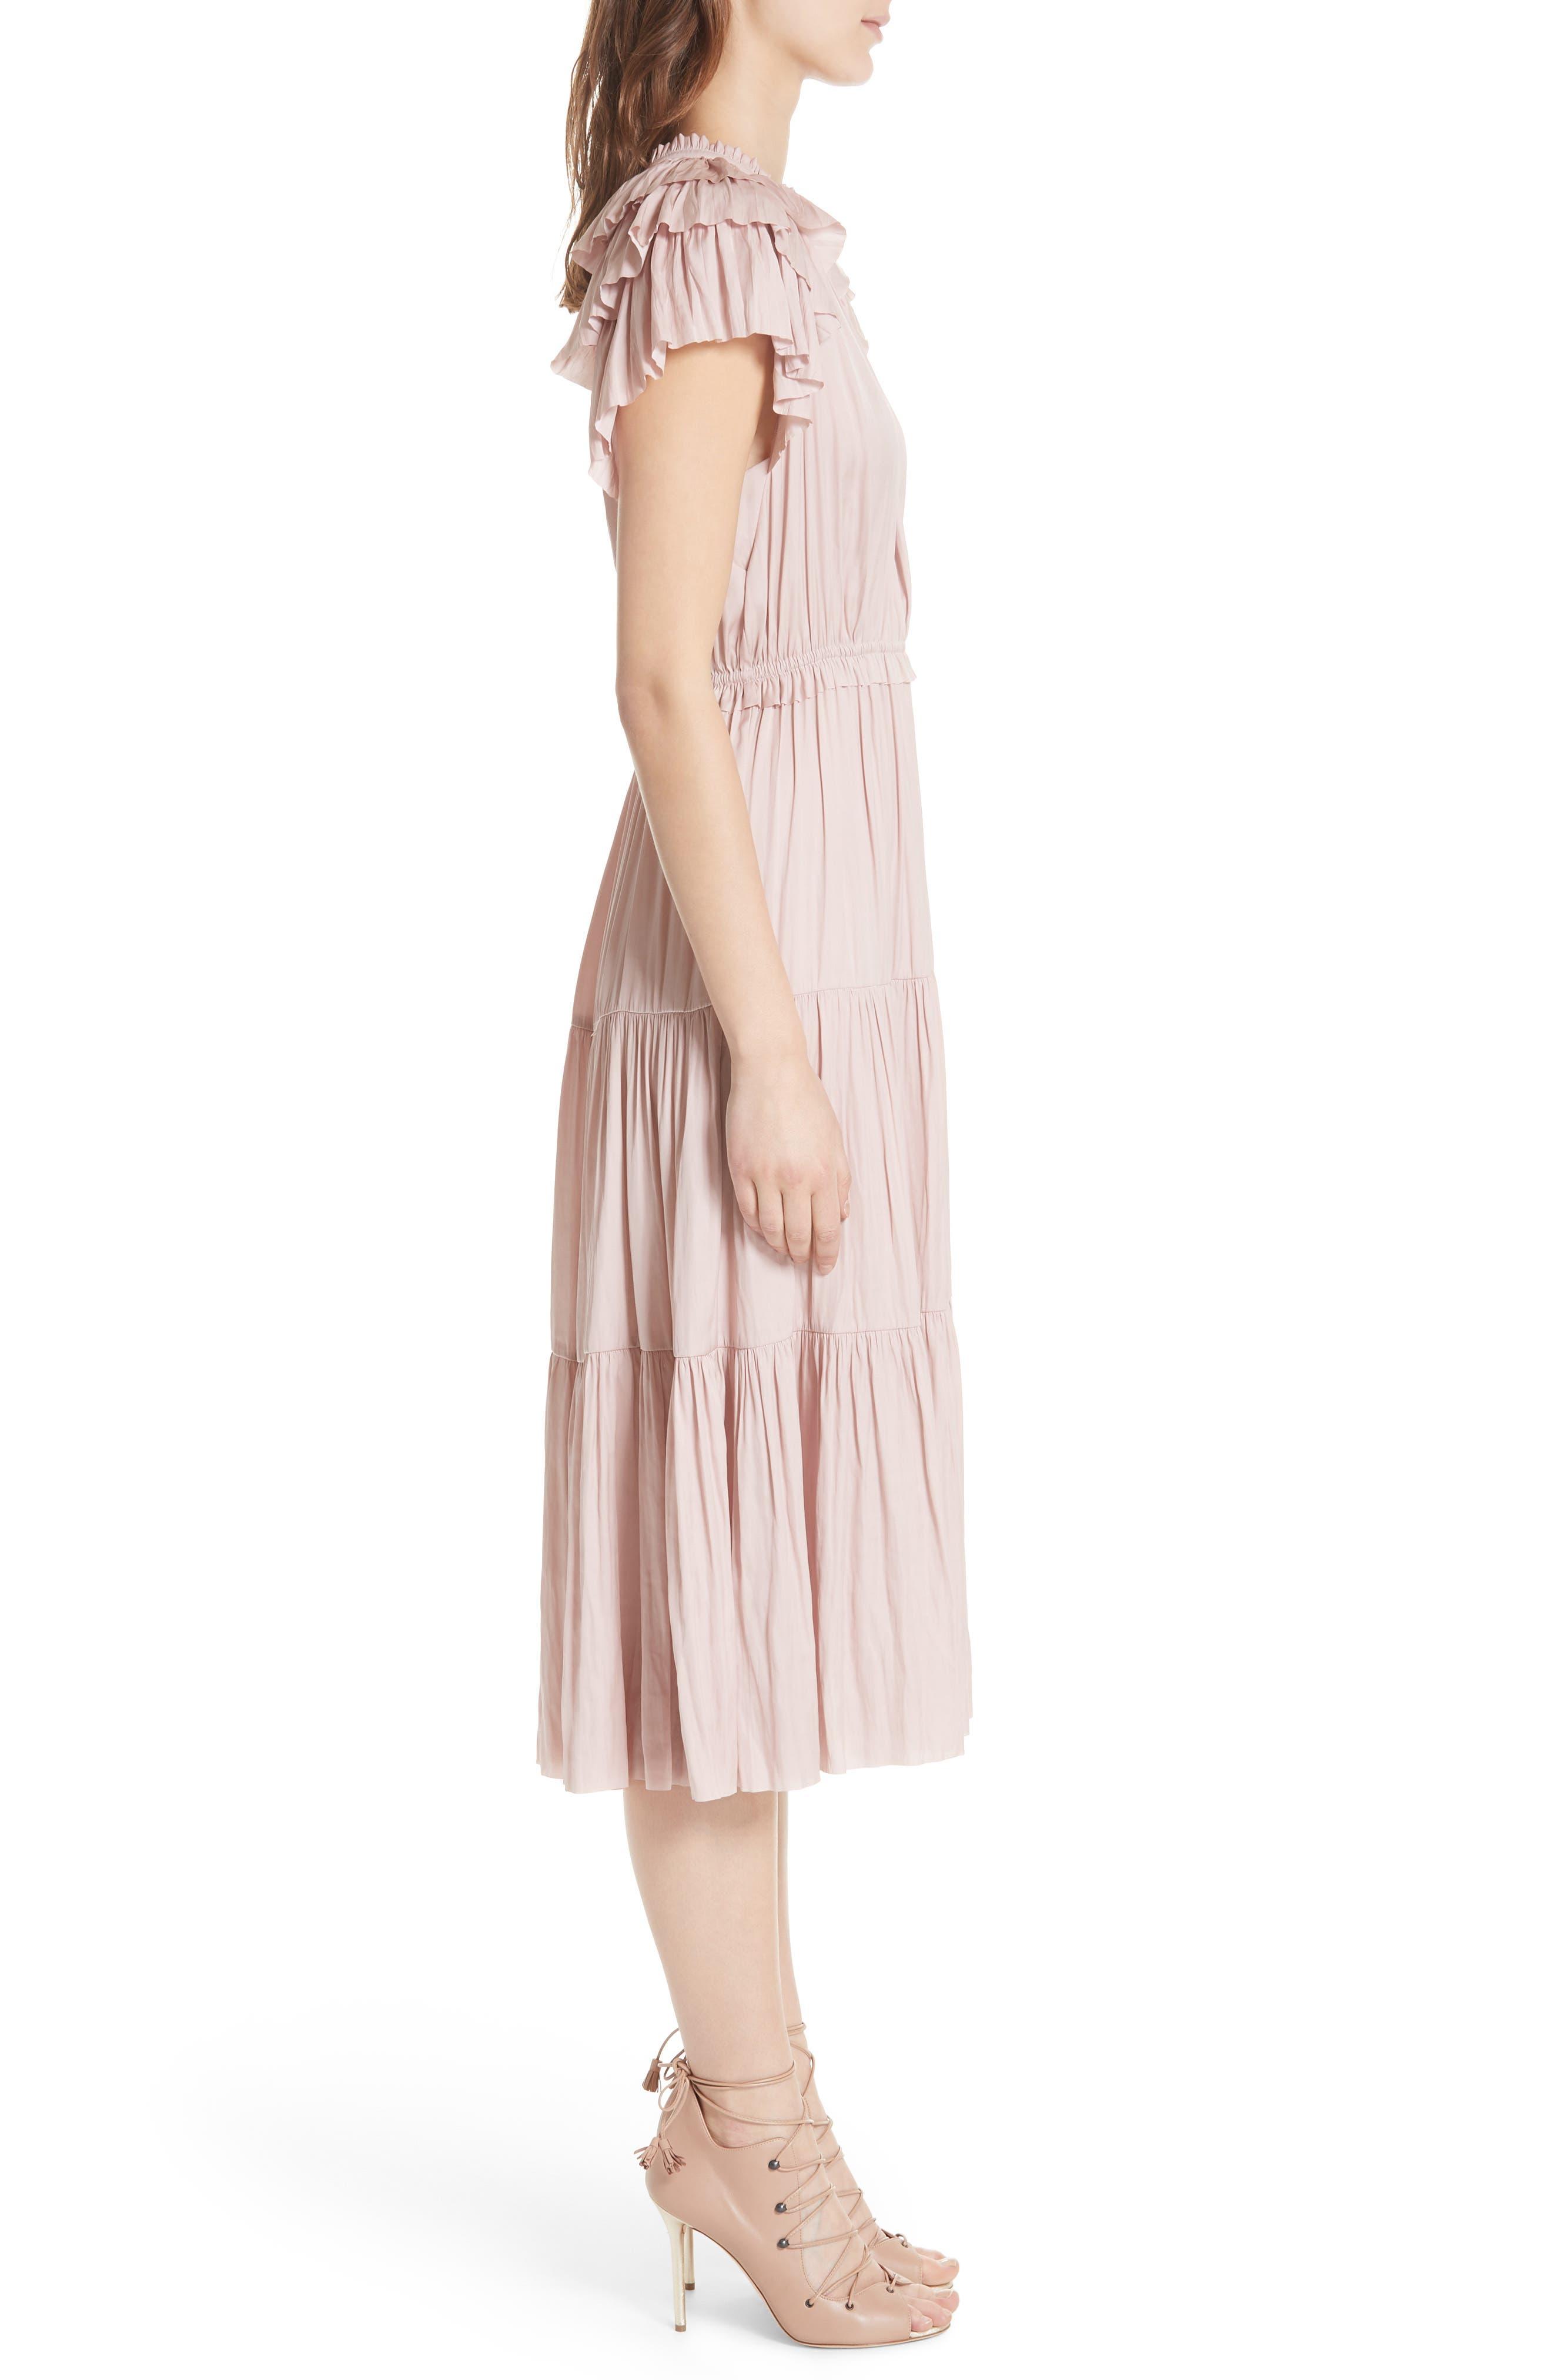 Blaire Satin Dress,                             Alternate thumbnail 3, color,                             600